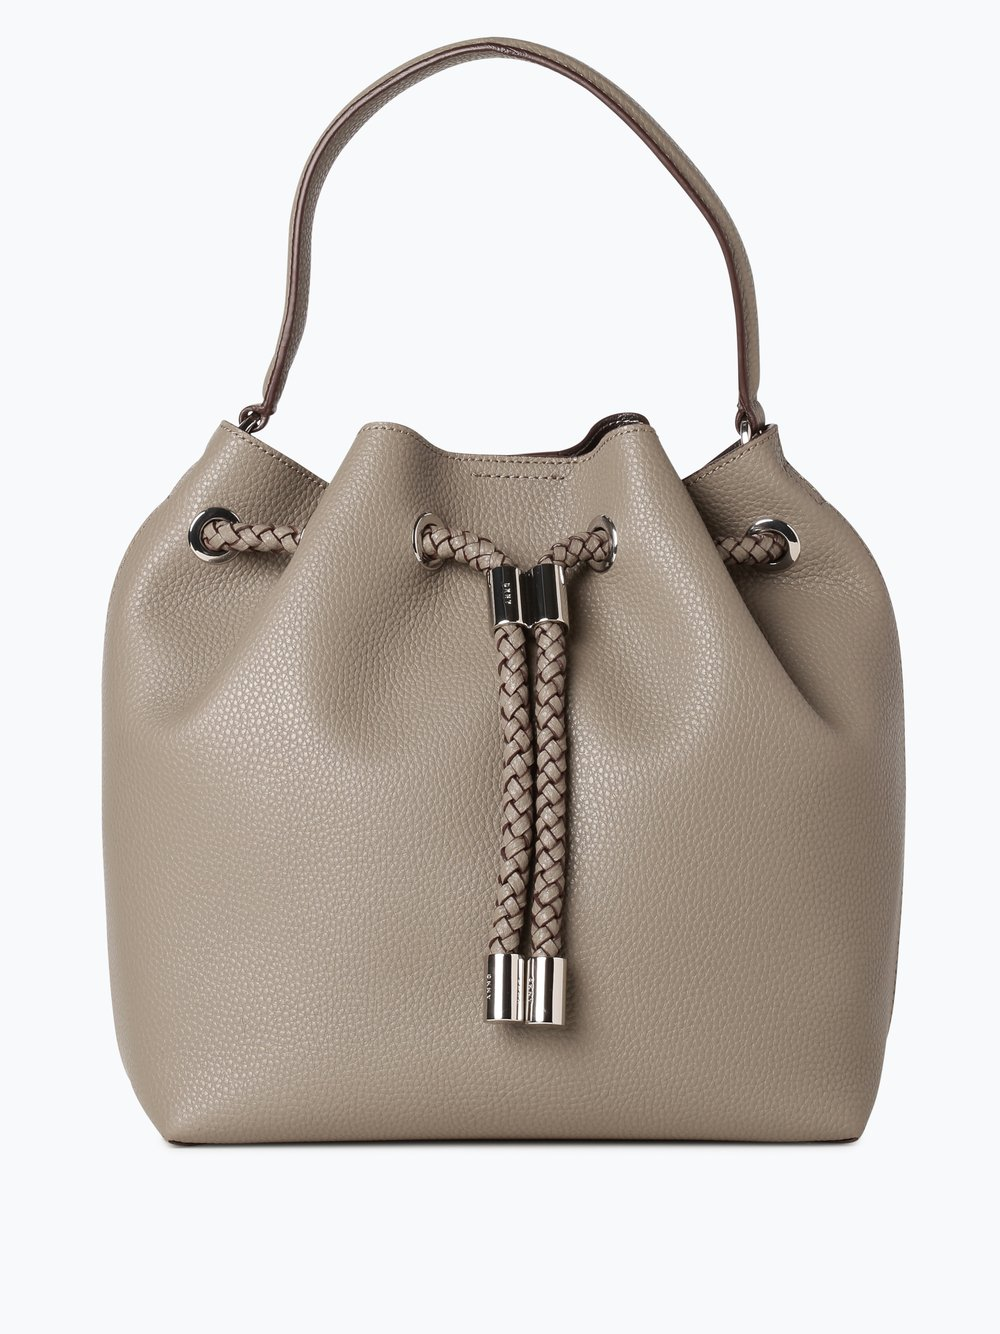 67537a7175054 DKNY Damska torba na ramię ze skóry kup online   VANGRAAF.COM